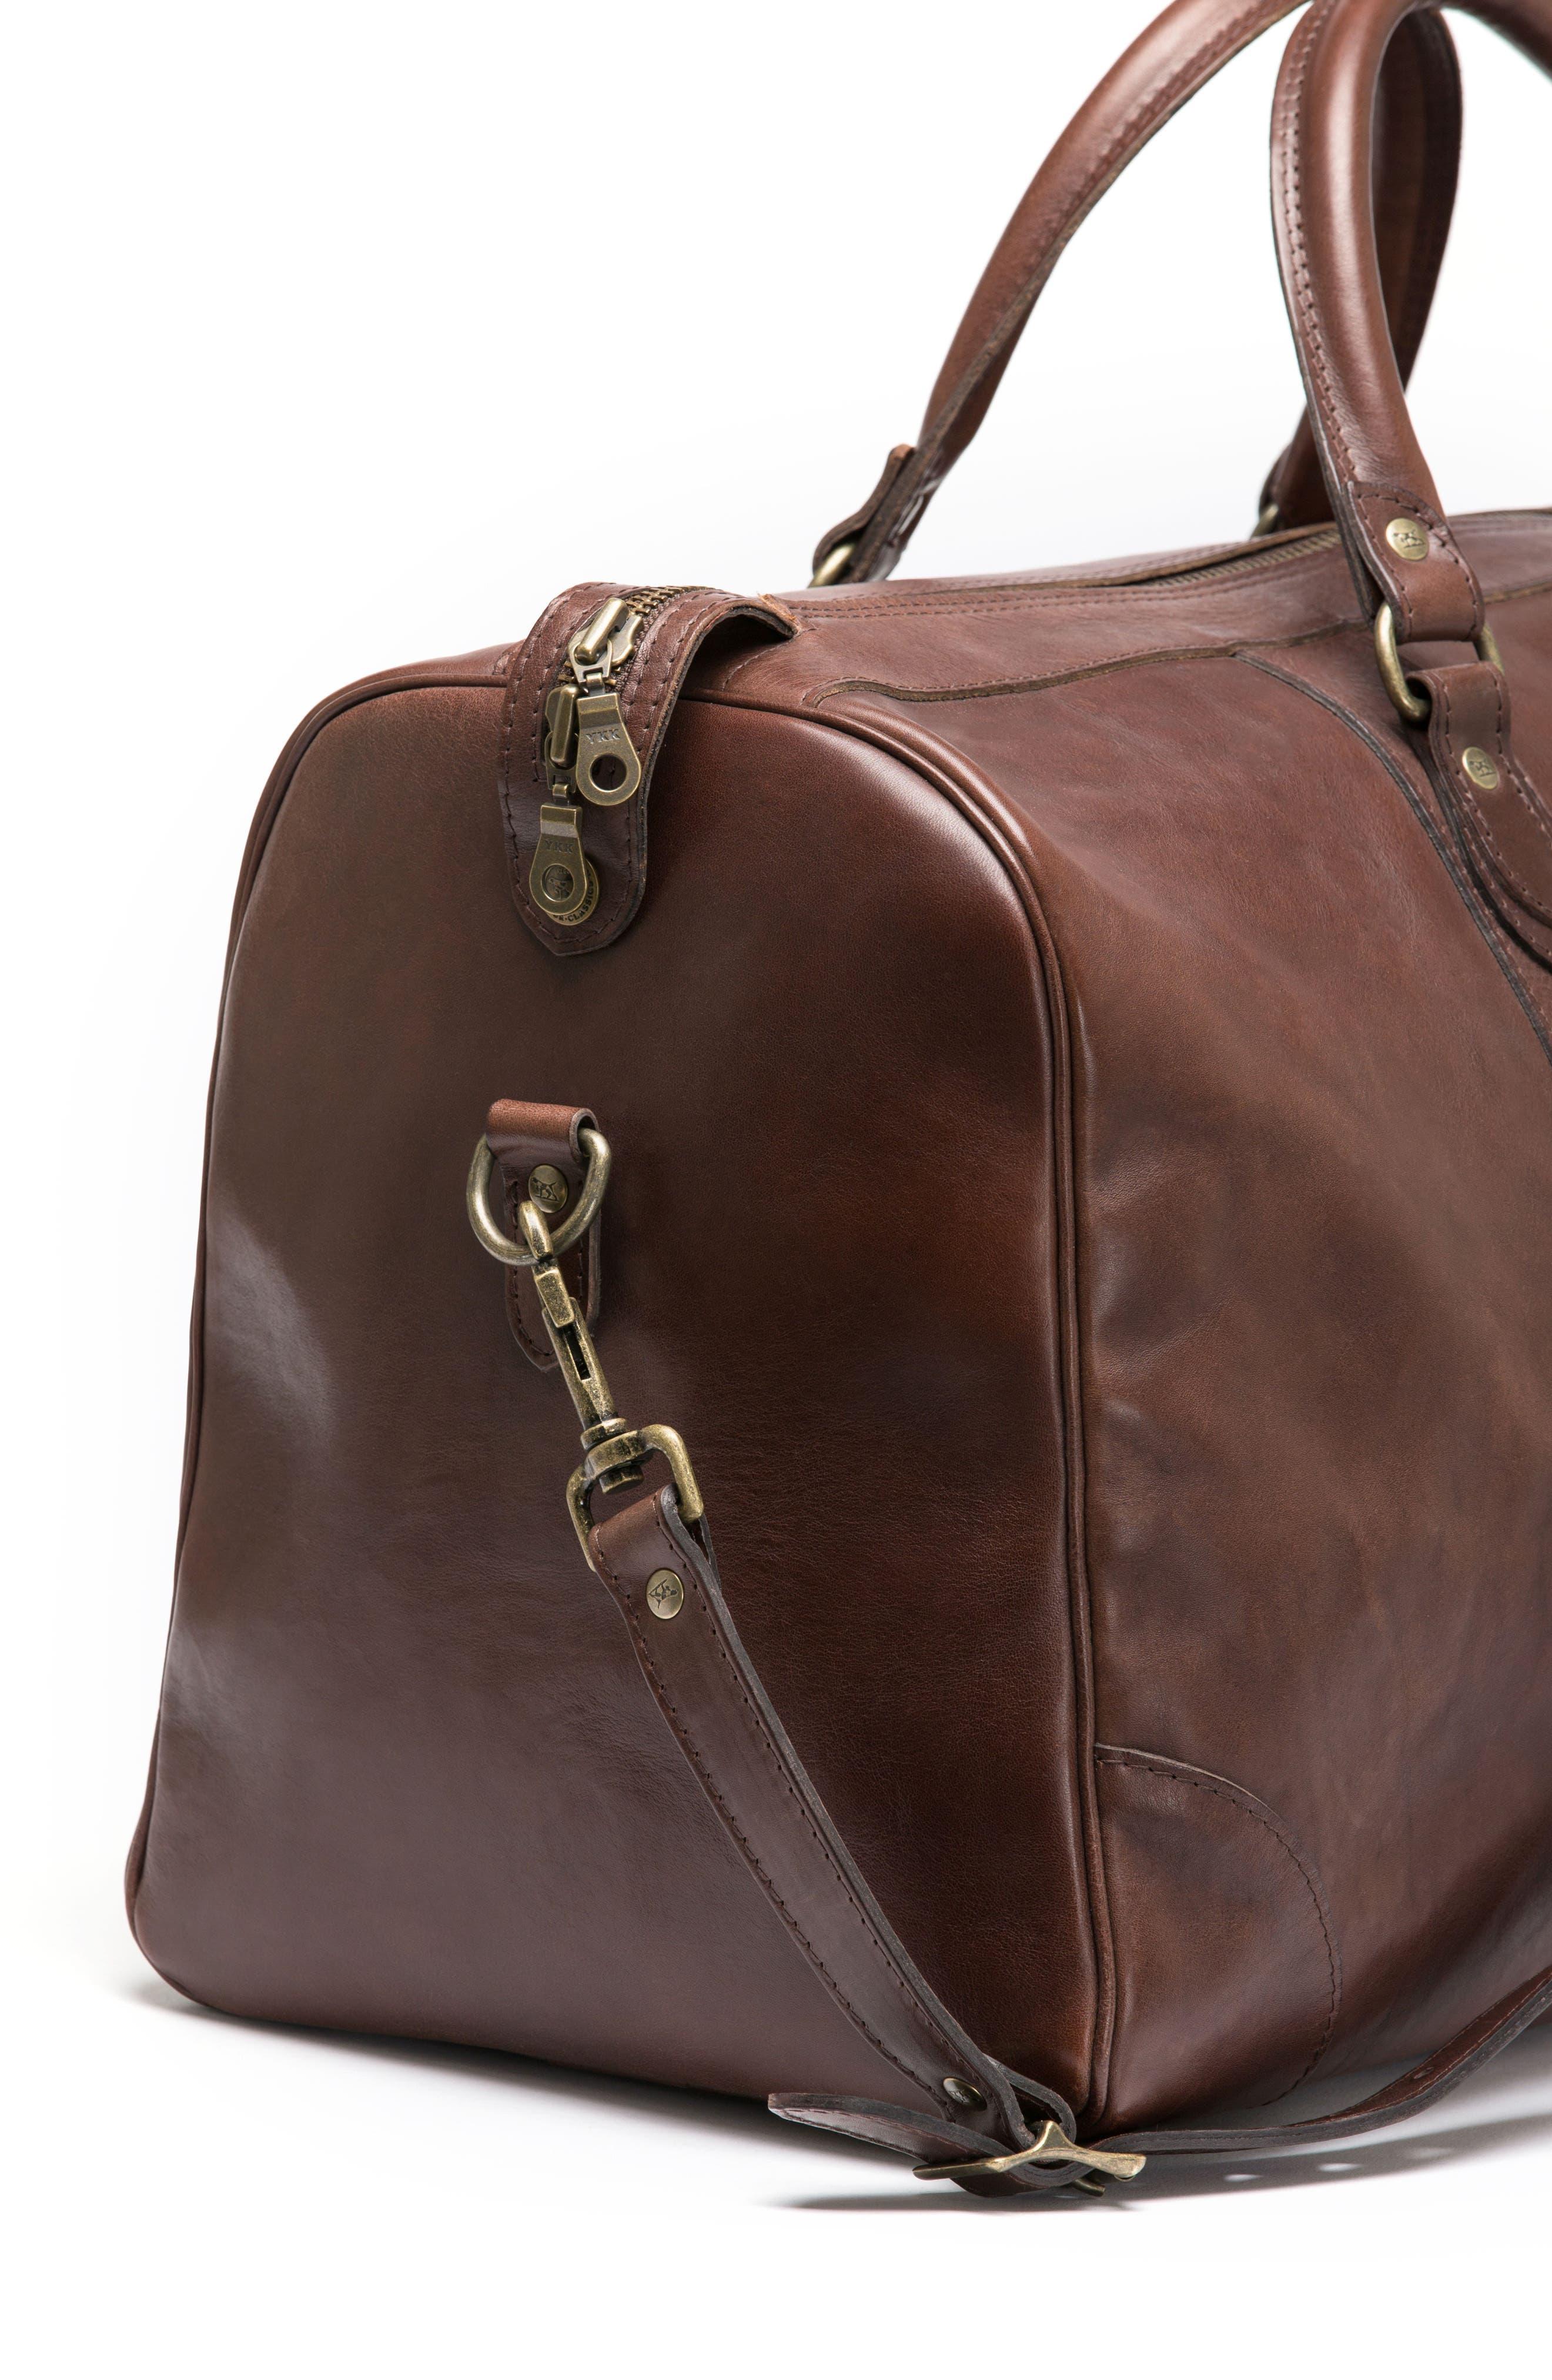 RODD & GUNN,                             Leather Duffel Bag,                             Alternate thumbnail 4, color,                             216